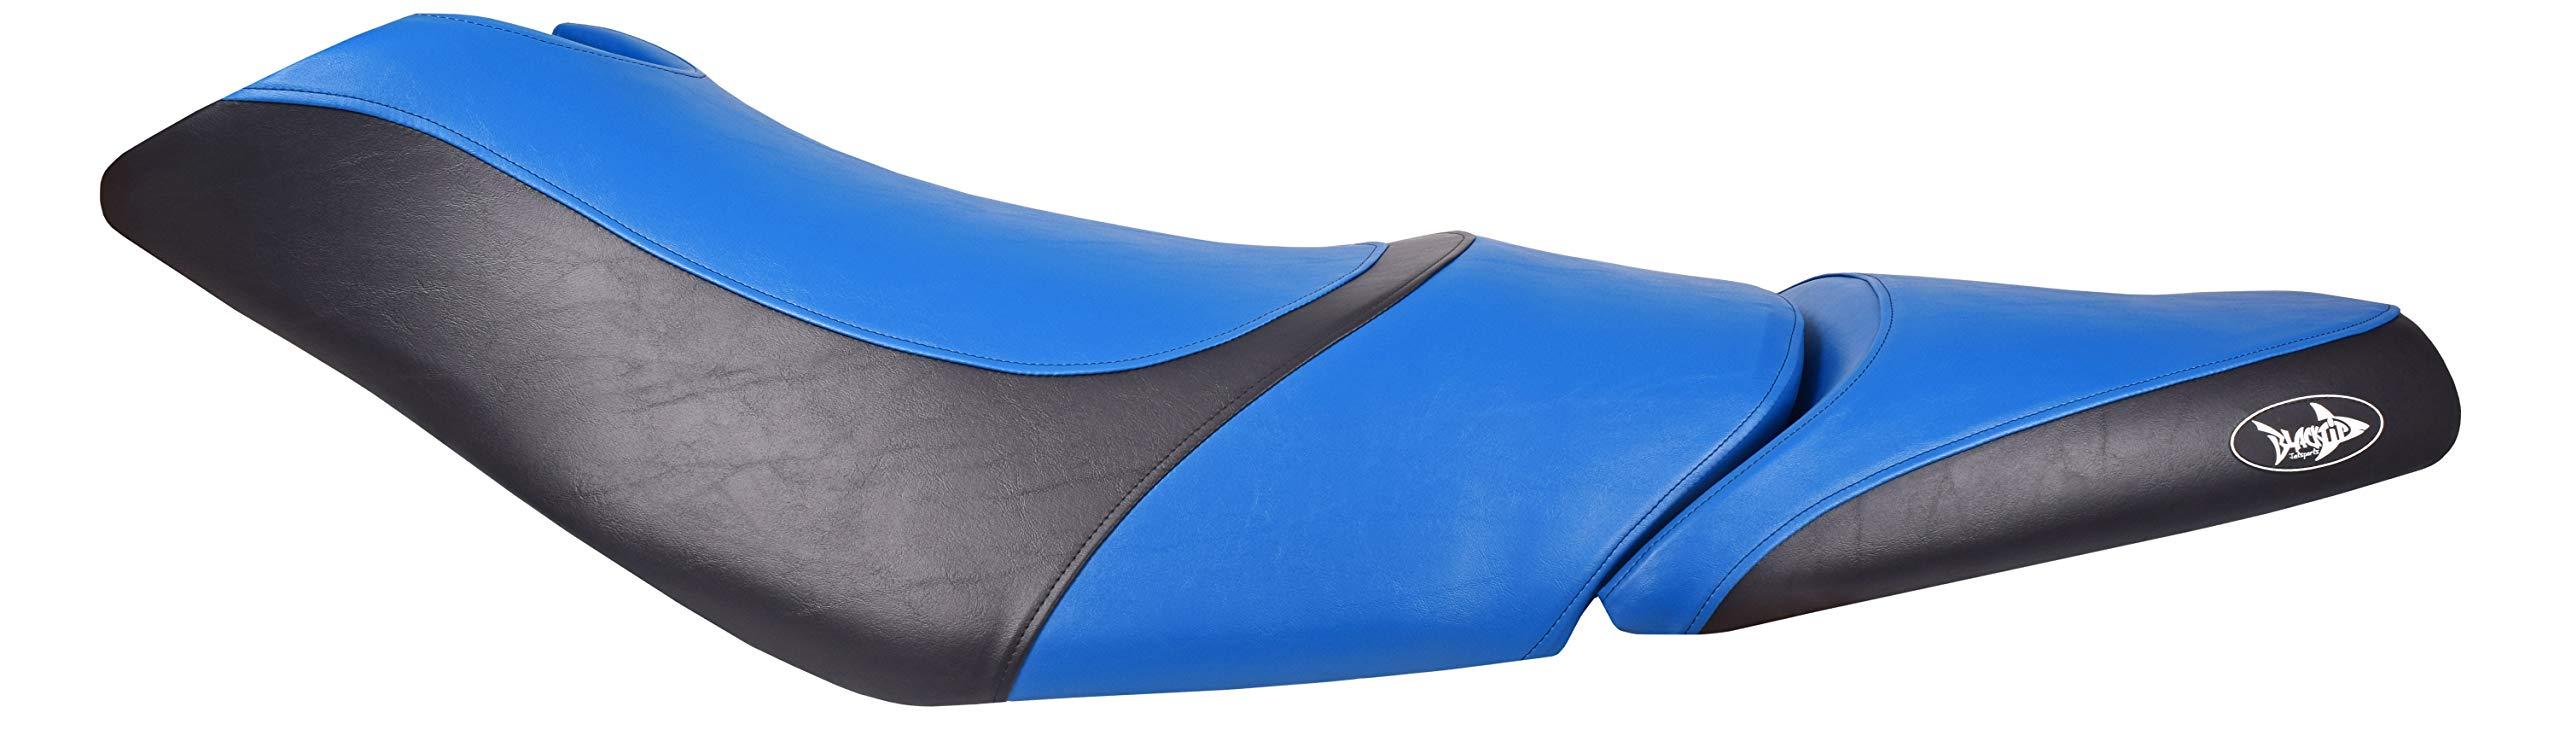 Sea-Doo Seat Cover 2001-2005 GTI, 2002-2004 GTI LE, 2003-2005 GTI LE RFI, 2004-2005 GTI RFI, 2001 GTS